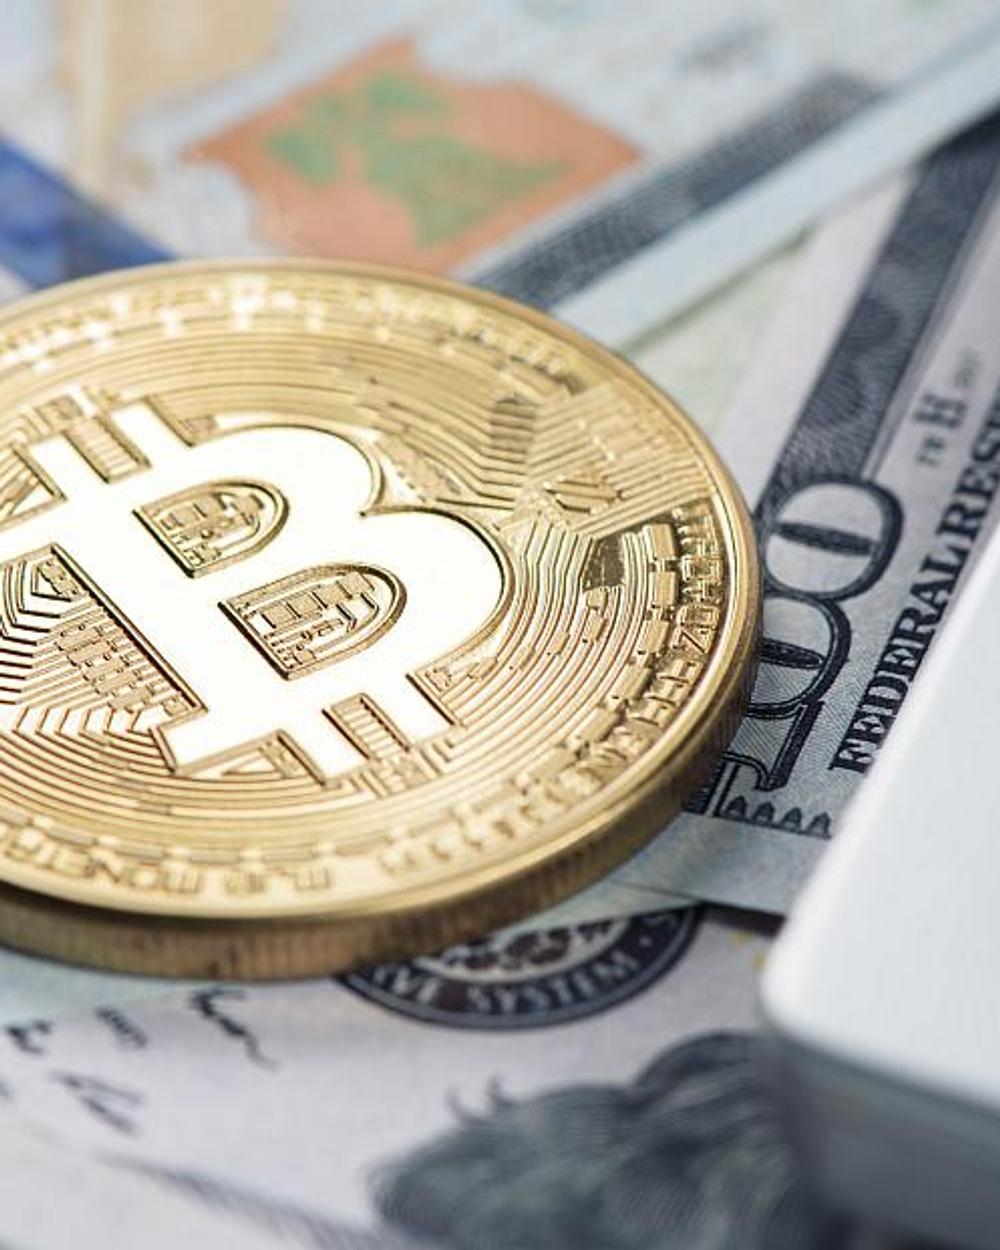 kako trgovati kriptovalutom da biste zaradili uložiti u bitcoin meme